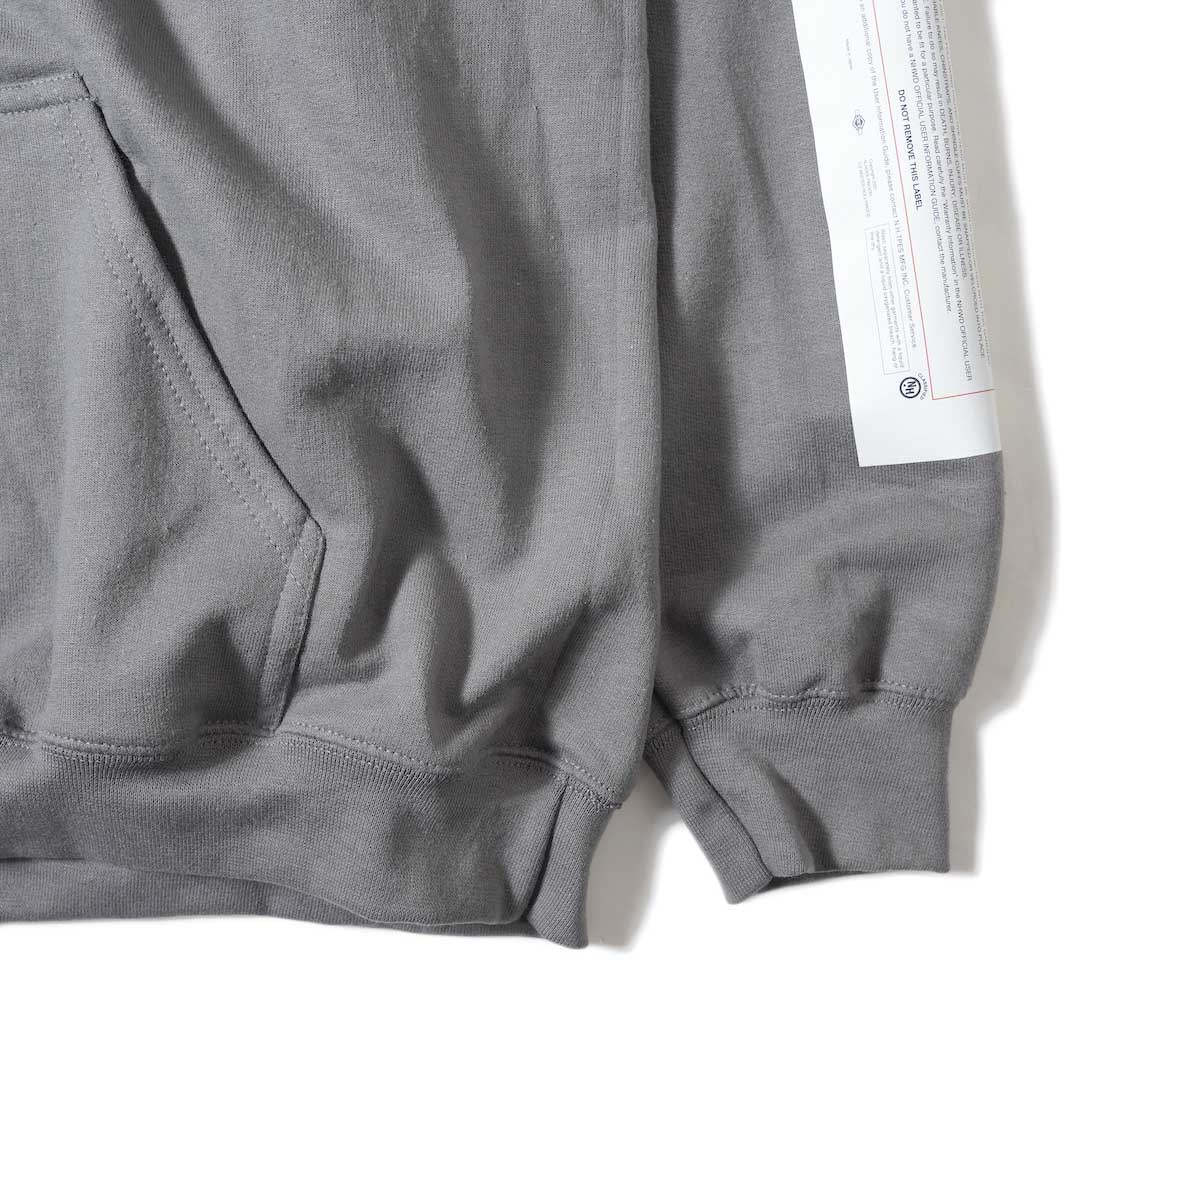 N.HOOLYWOOD / 9212-CS82 Hooded Parka (Charcoal)袖、裾